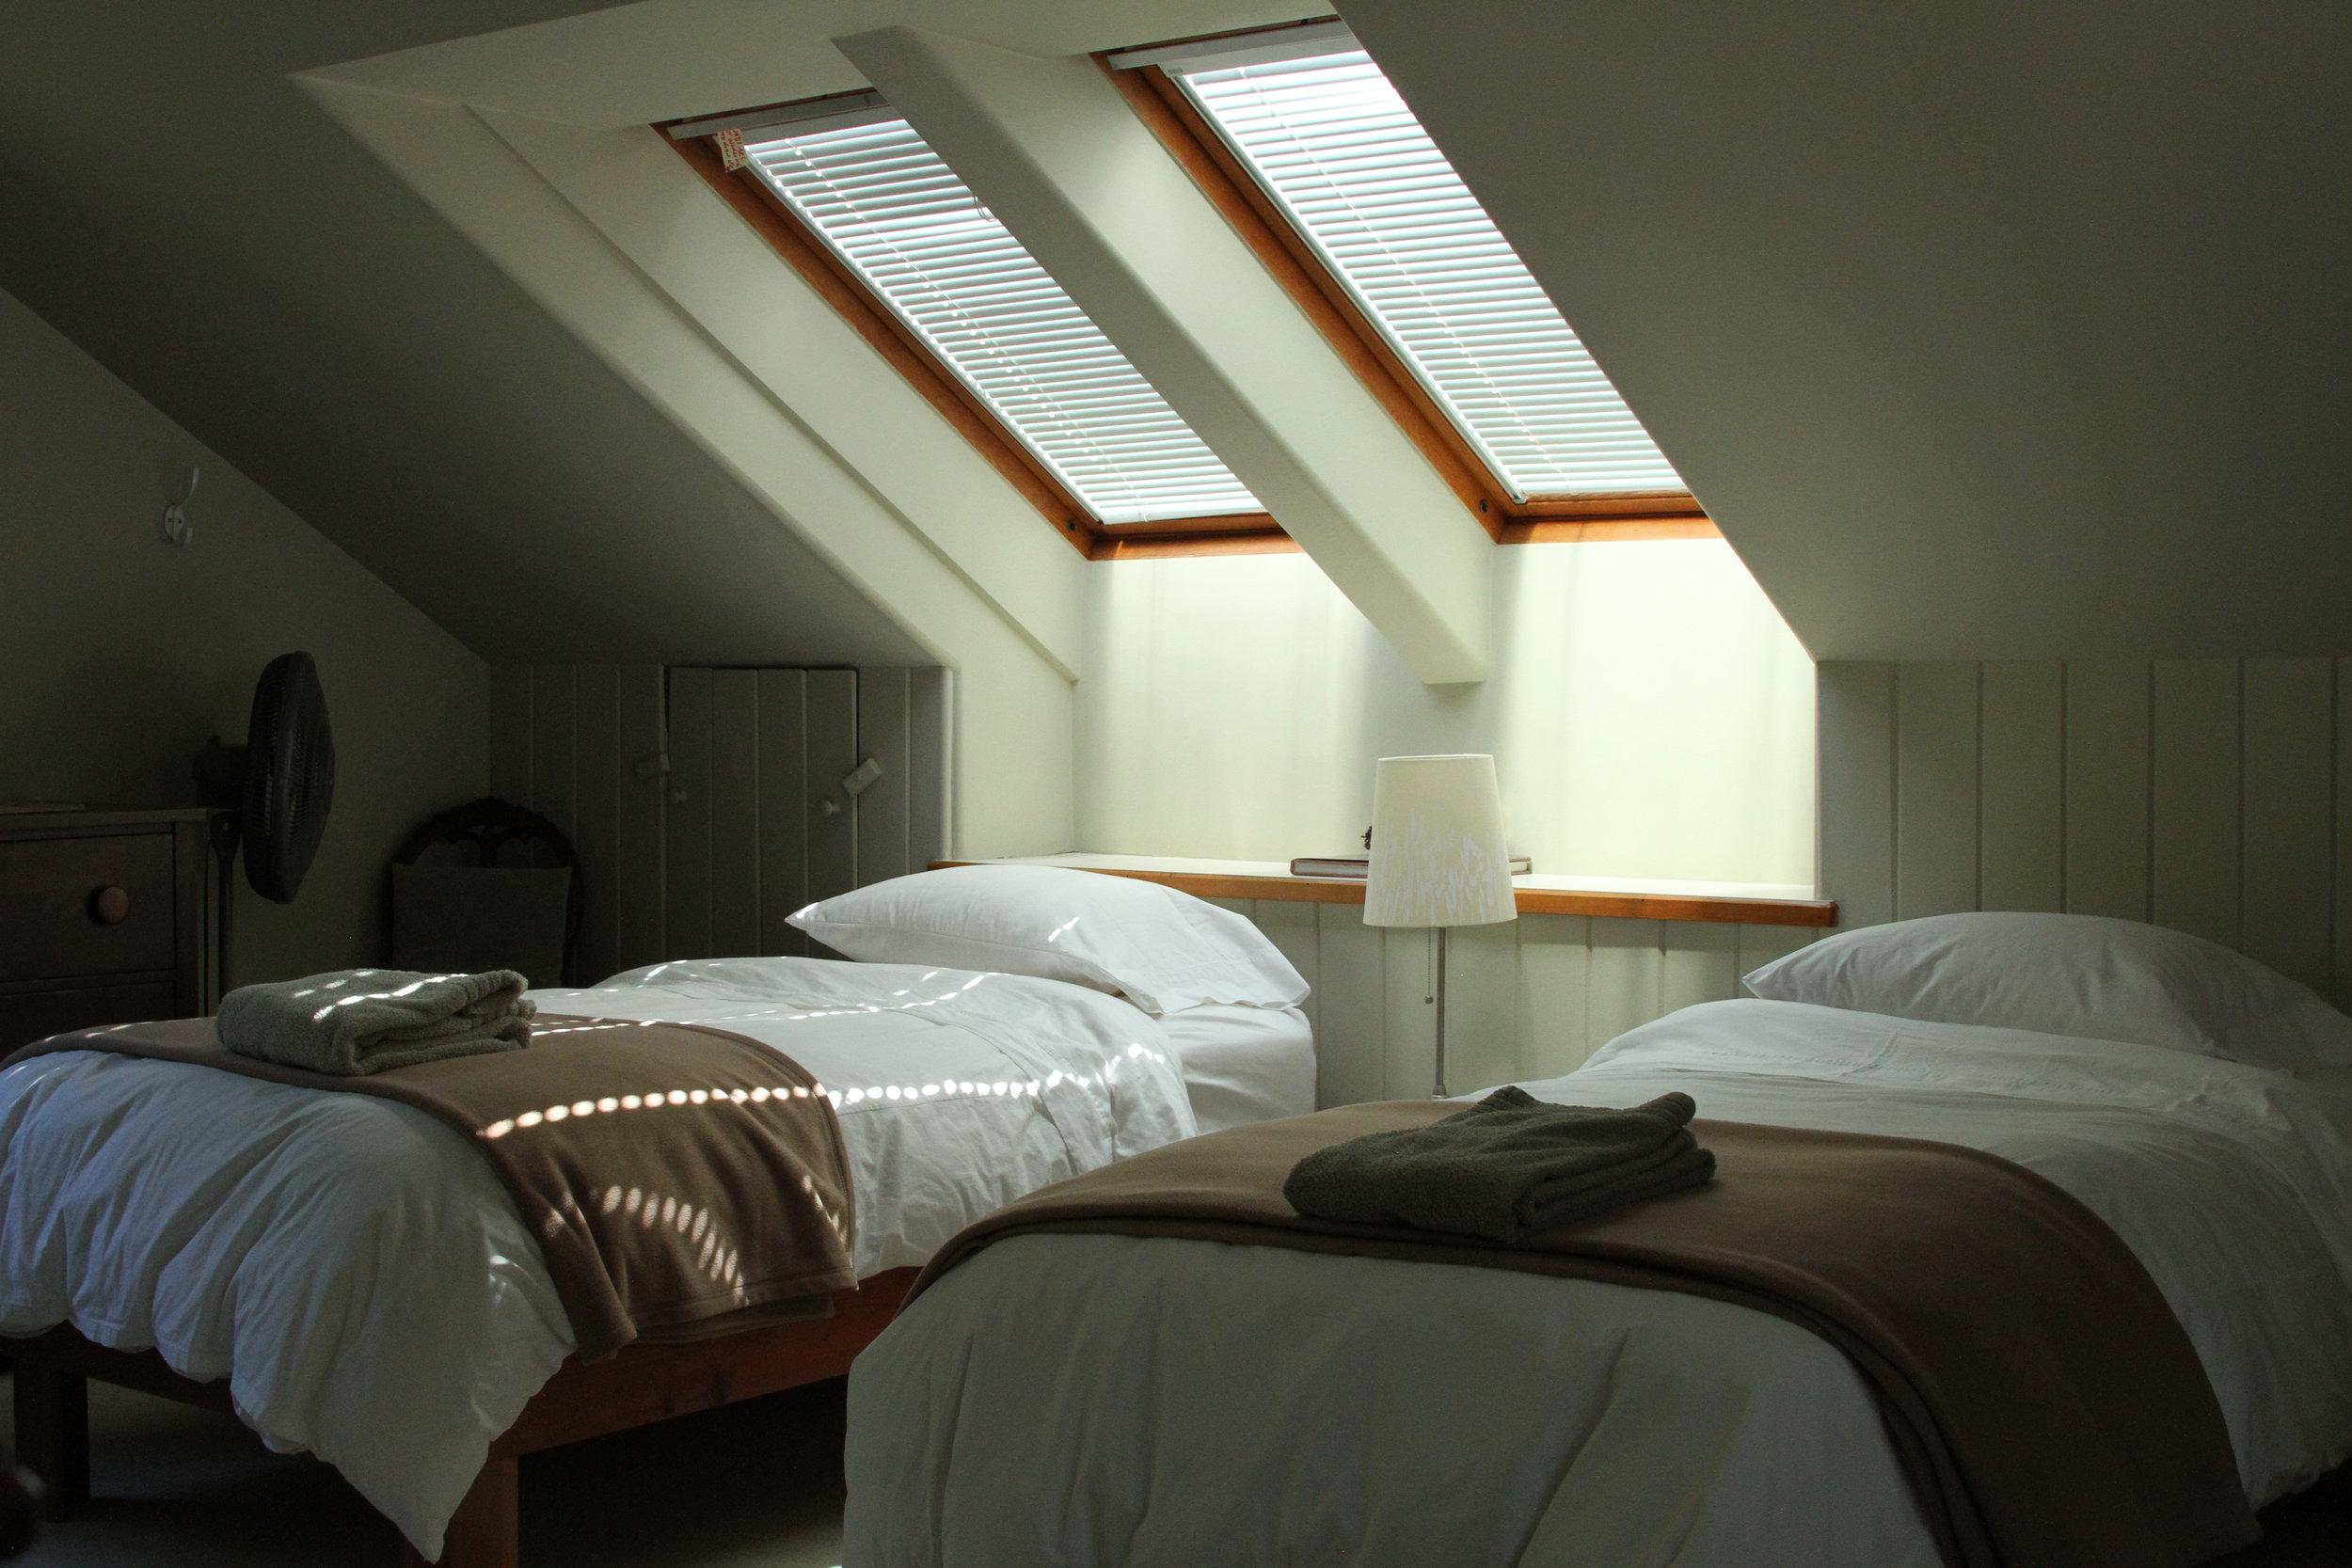 accommodations-seattle-retreat-return to zero-miscarriage-stillbirth-pregnancy loss